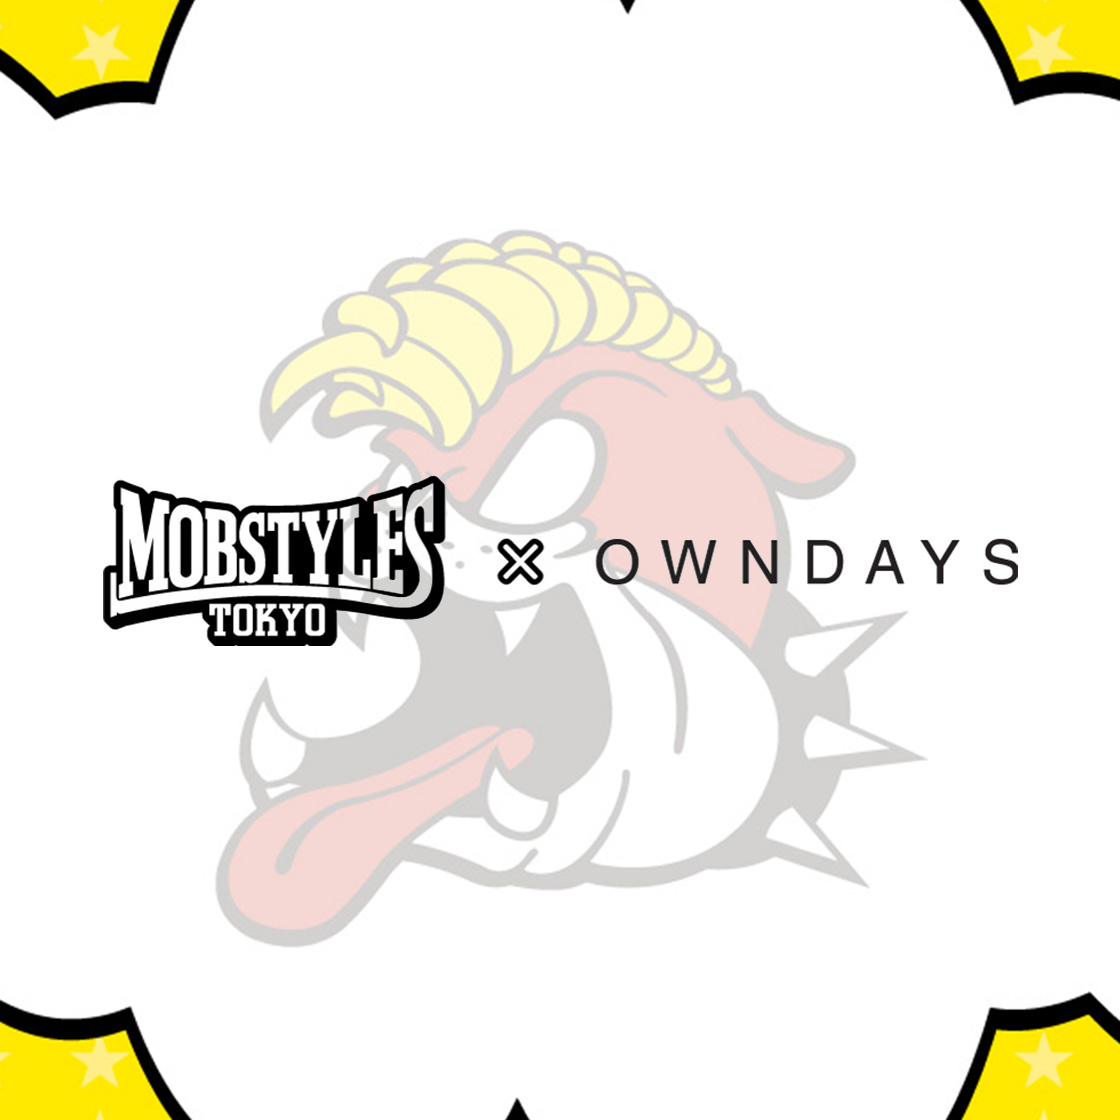 【完売】MOBSTYLES x OWNDAYS